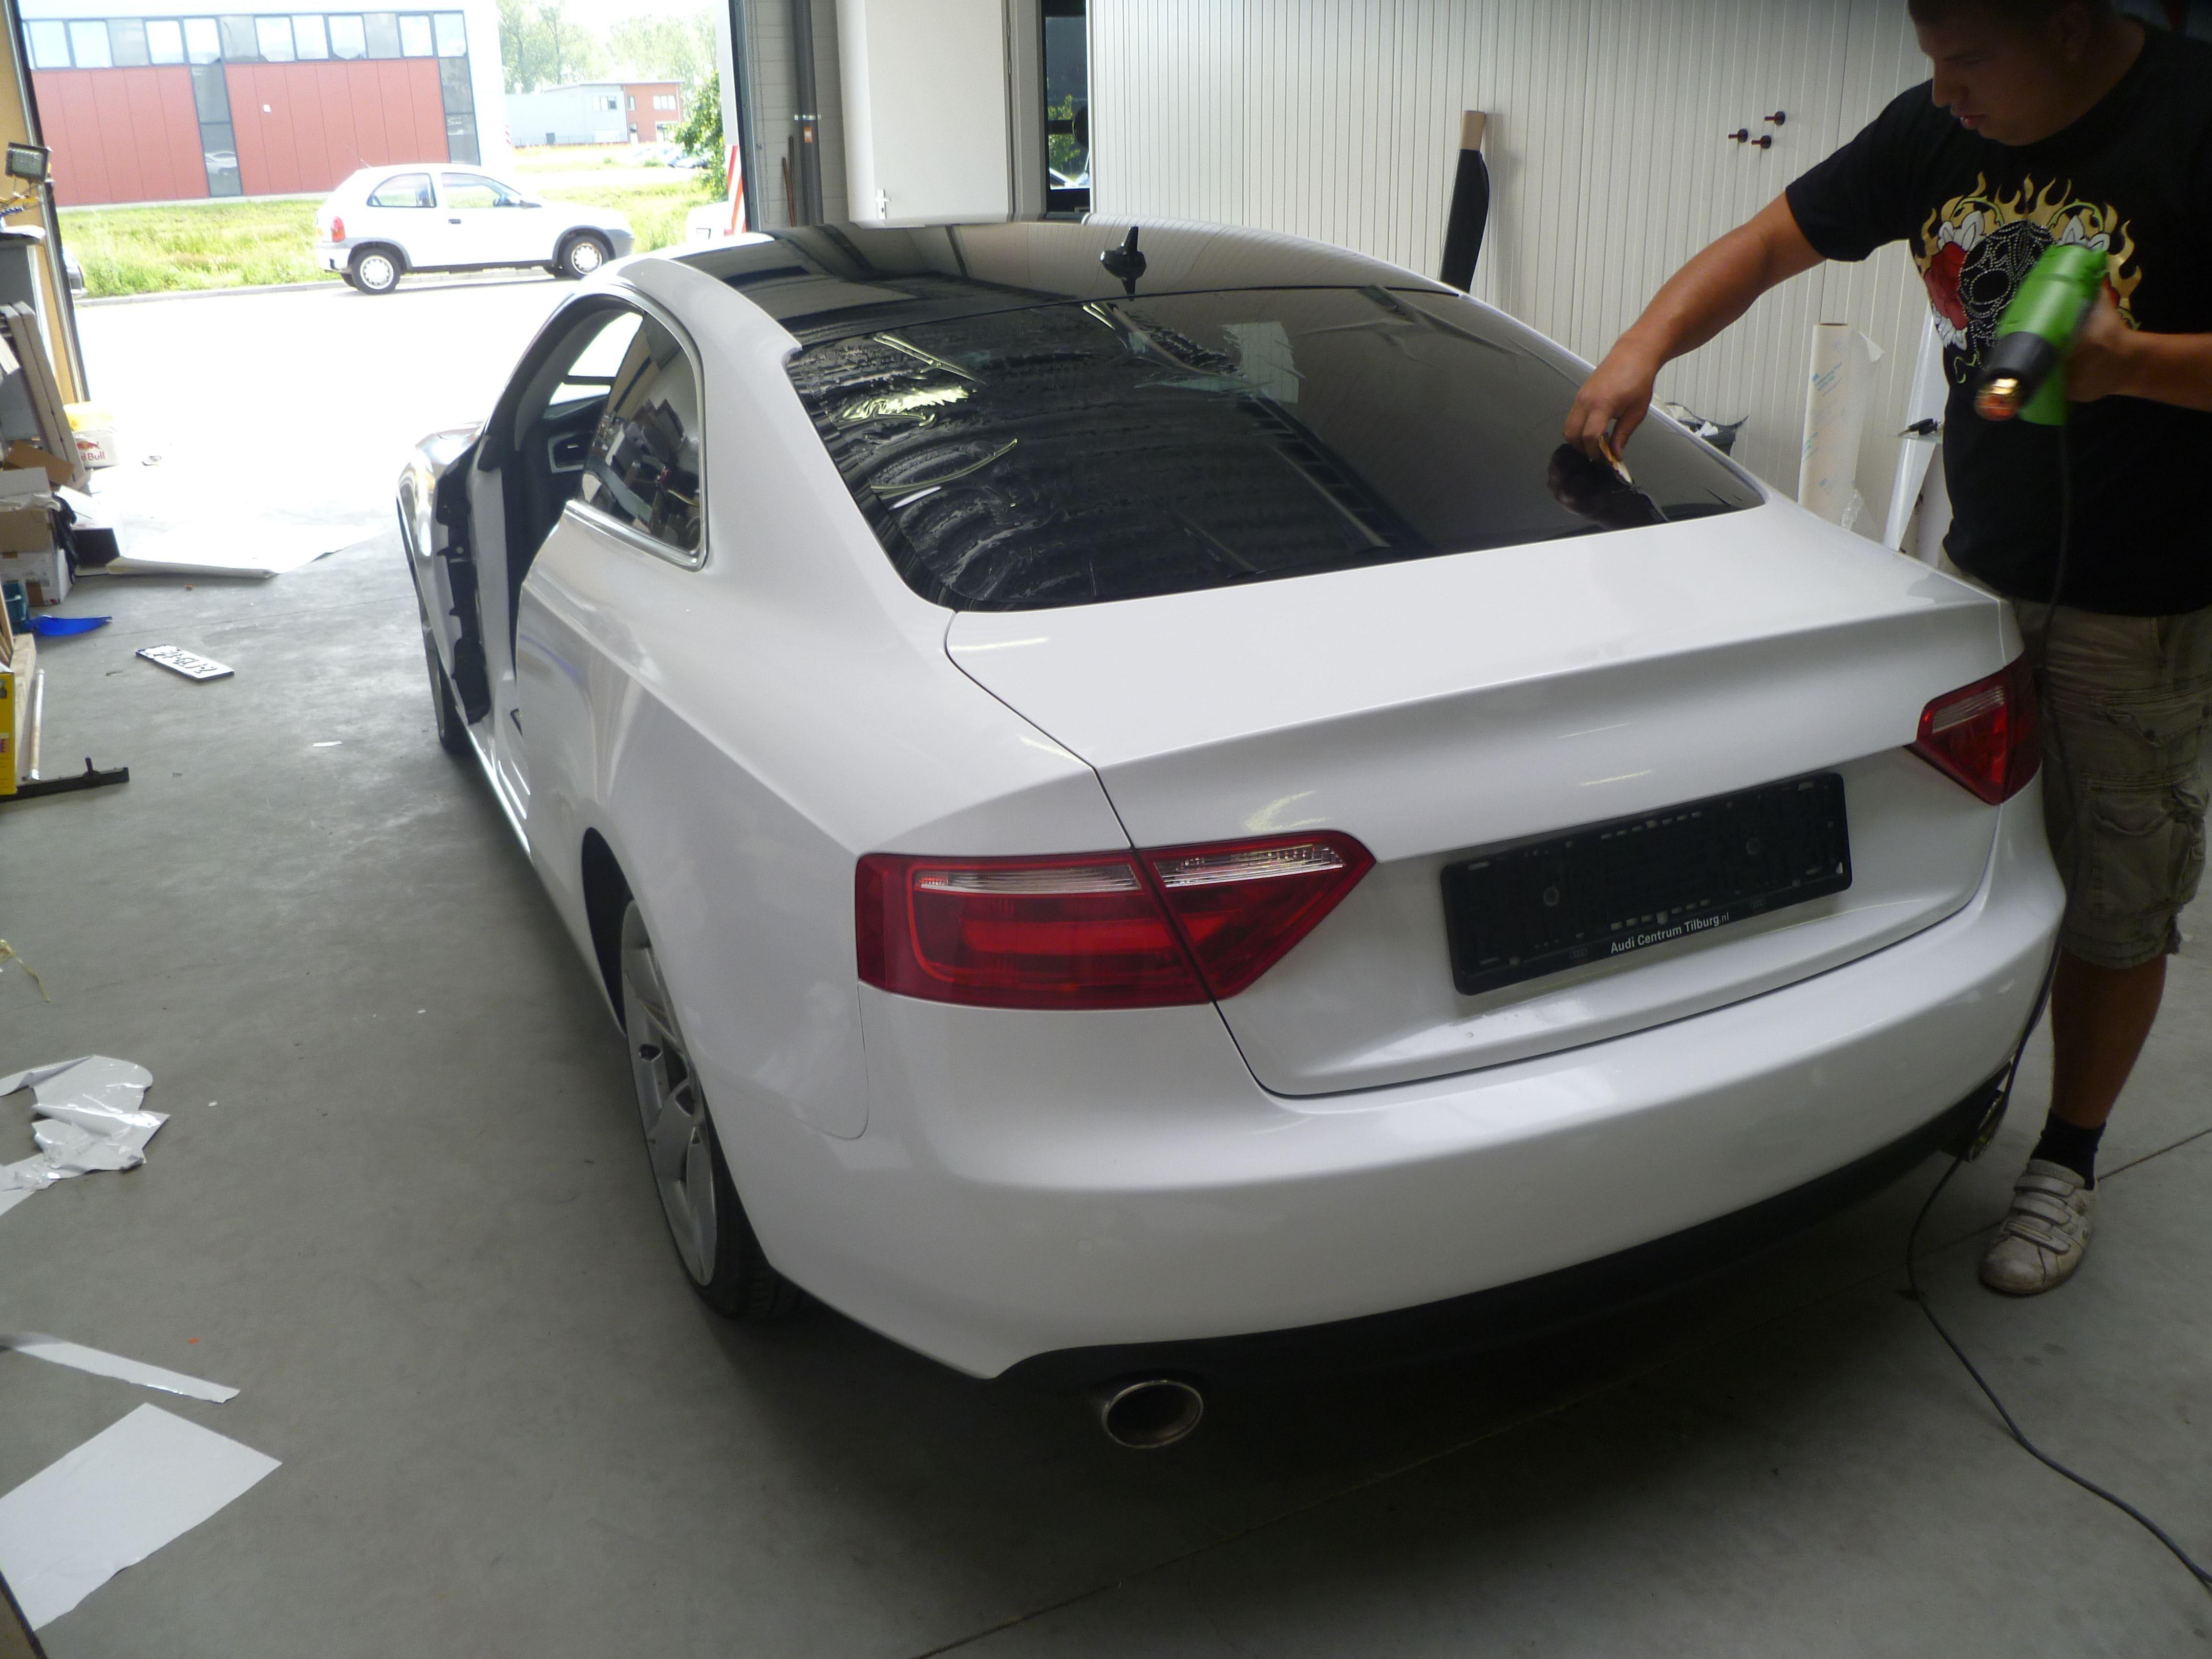 Audi A5 coupe met Metallic Witte Wrap, Carwrapping door Wrapmyride.nu Foto-nr:4735, ©2021